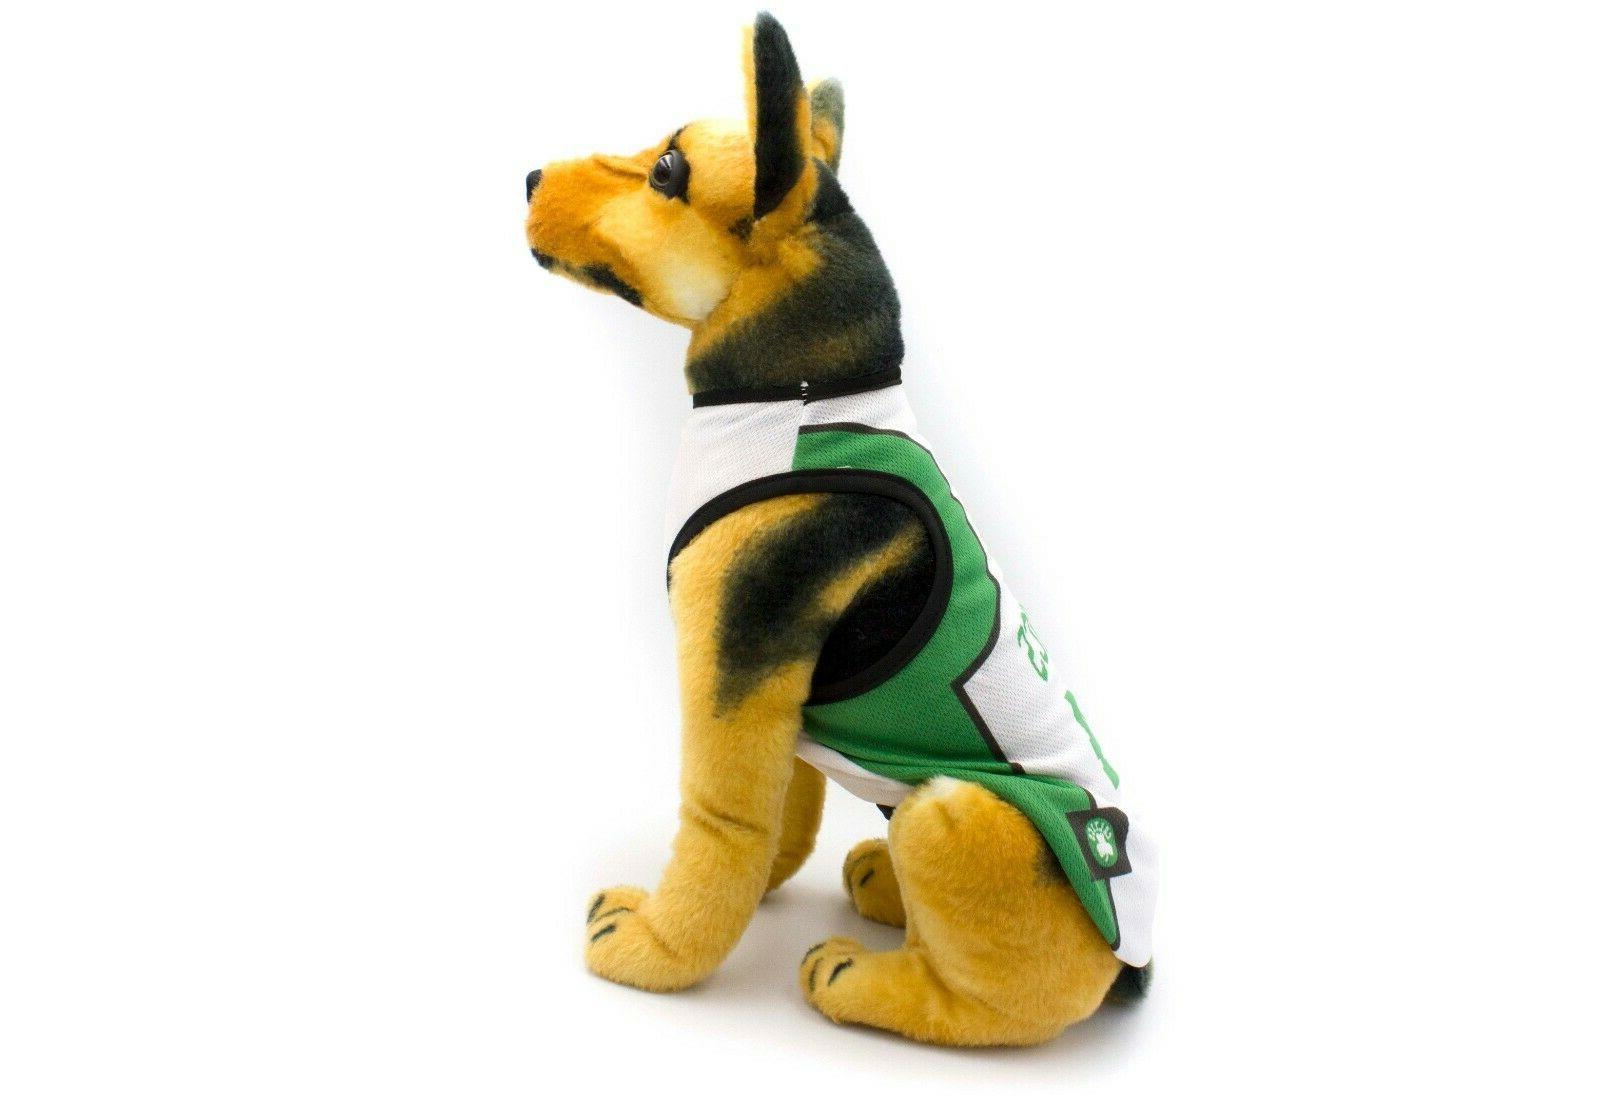 AXEL Boston Celtics Sporty Jersey